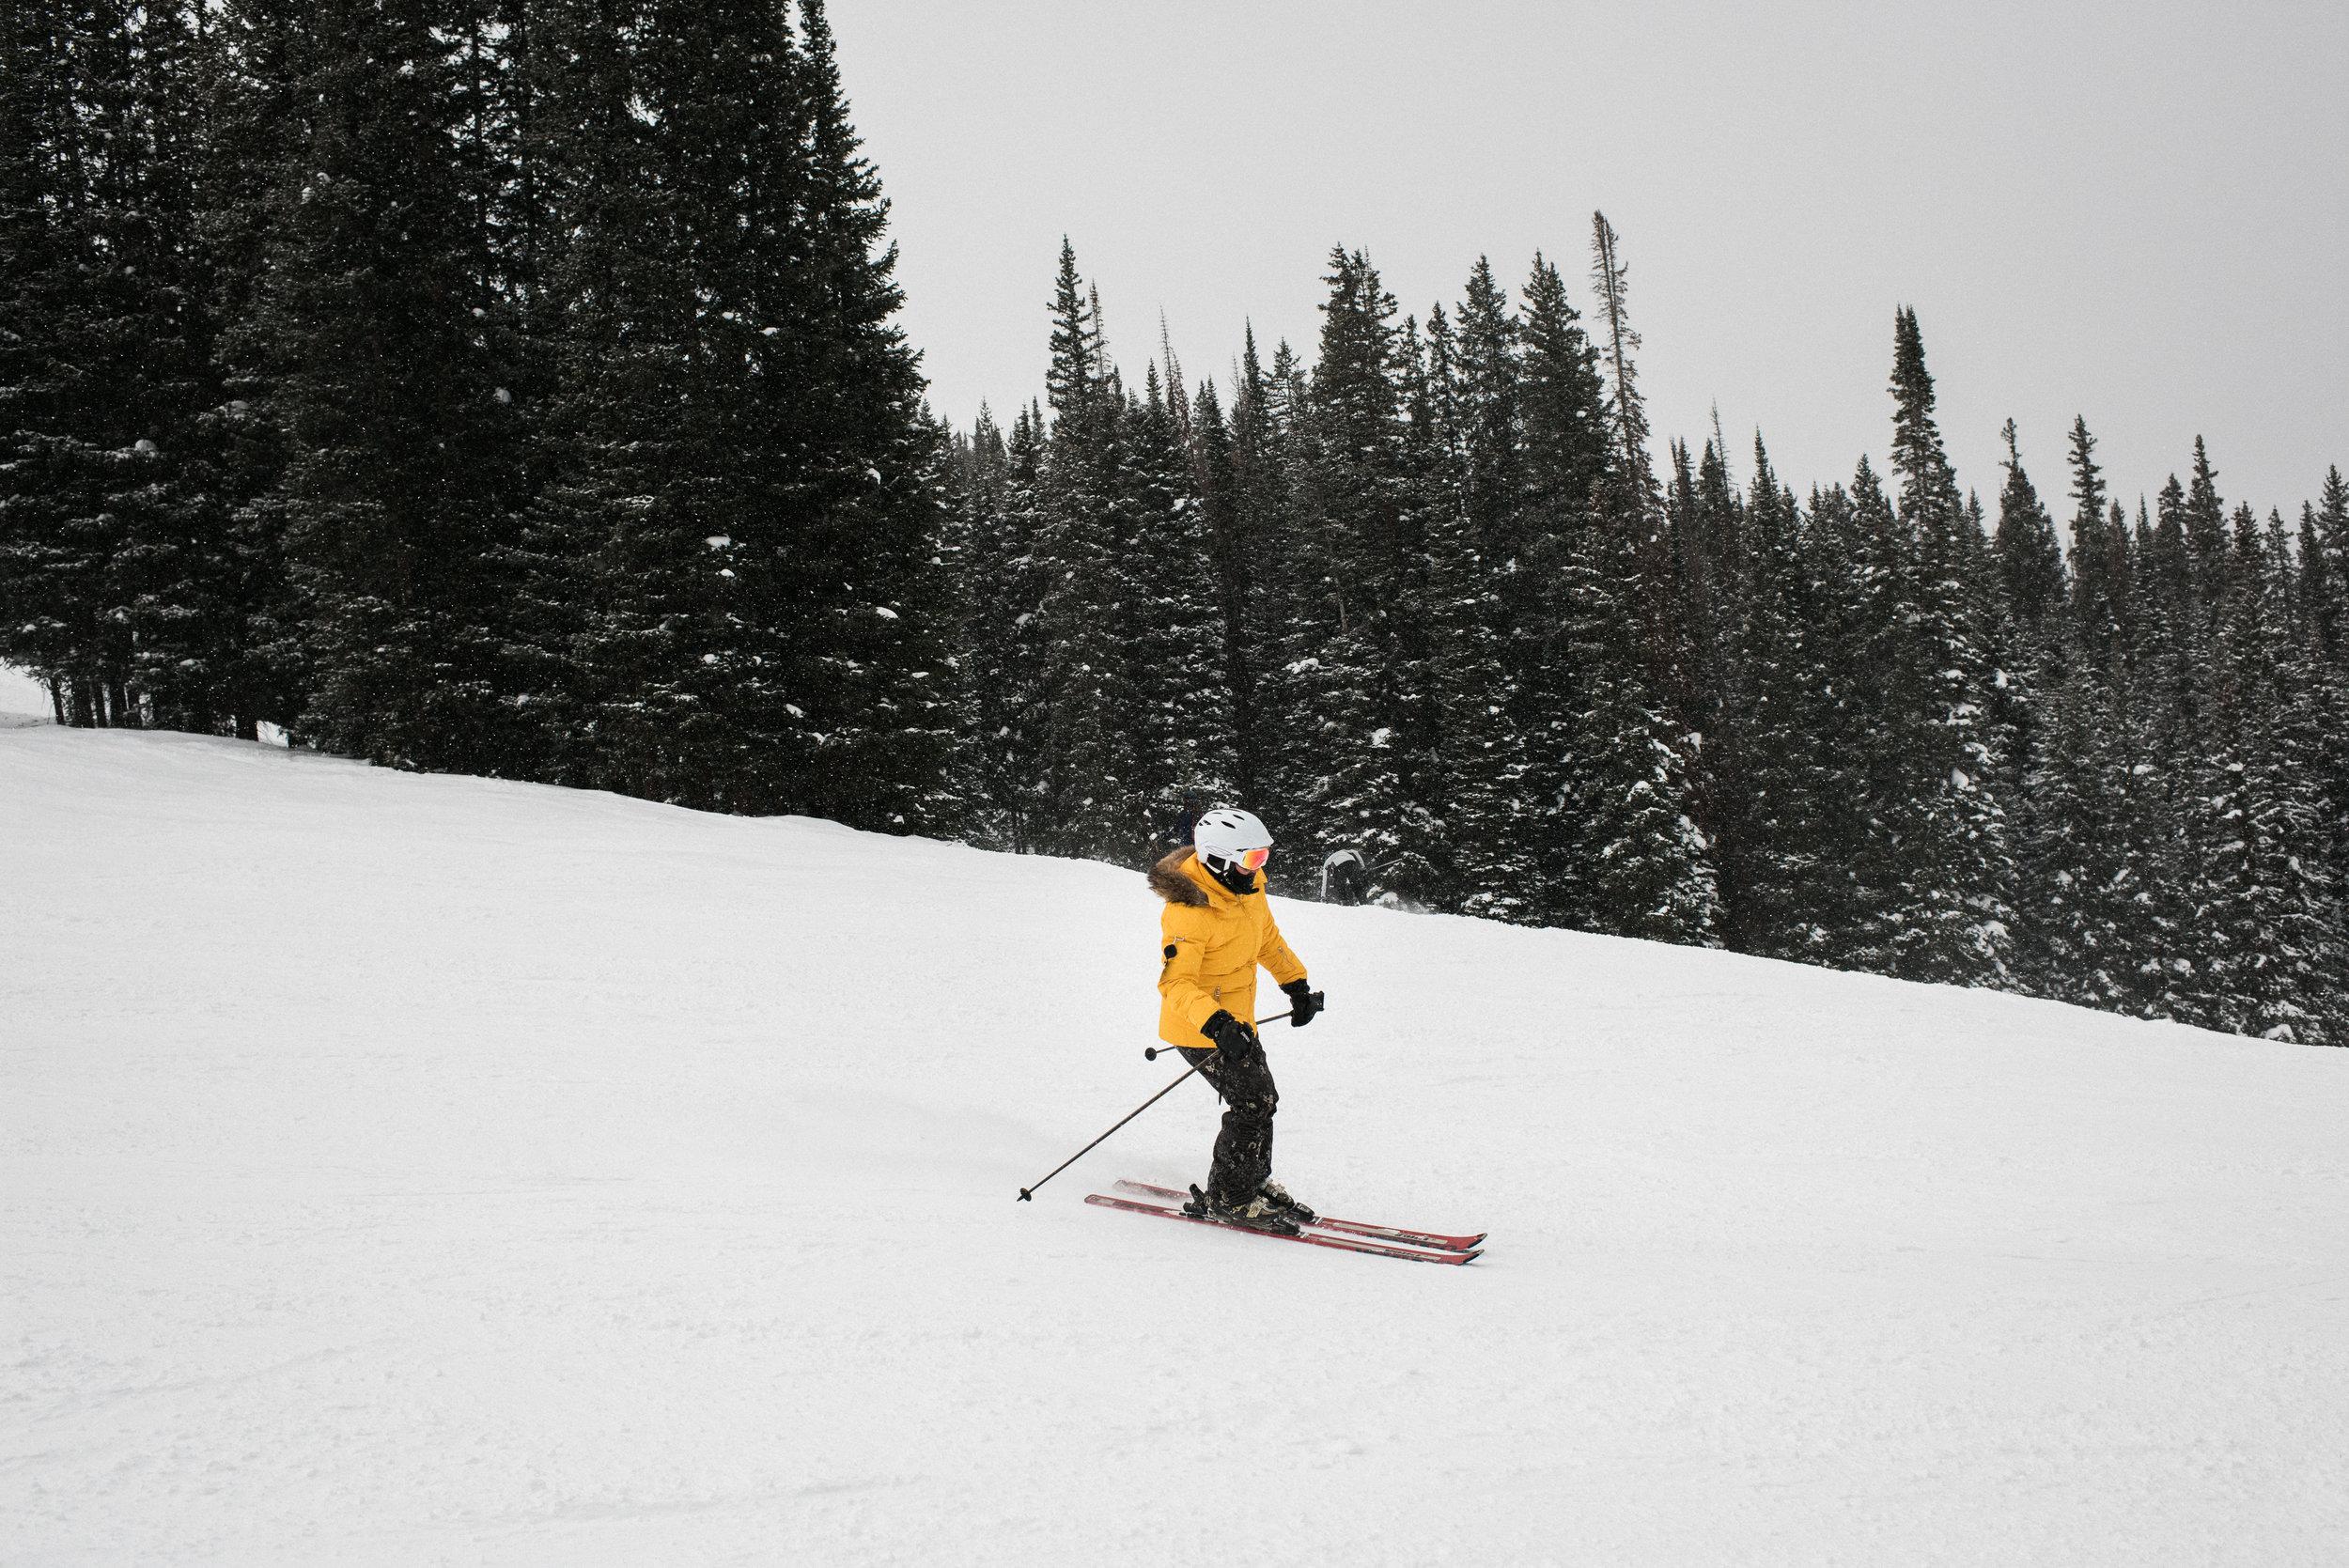 TaraShupe_Outdoor_Photographer_Loweprobags_Colorado_Copper_Mountains_Ski_12.jpg